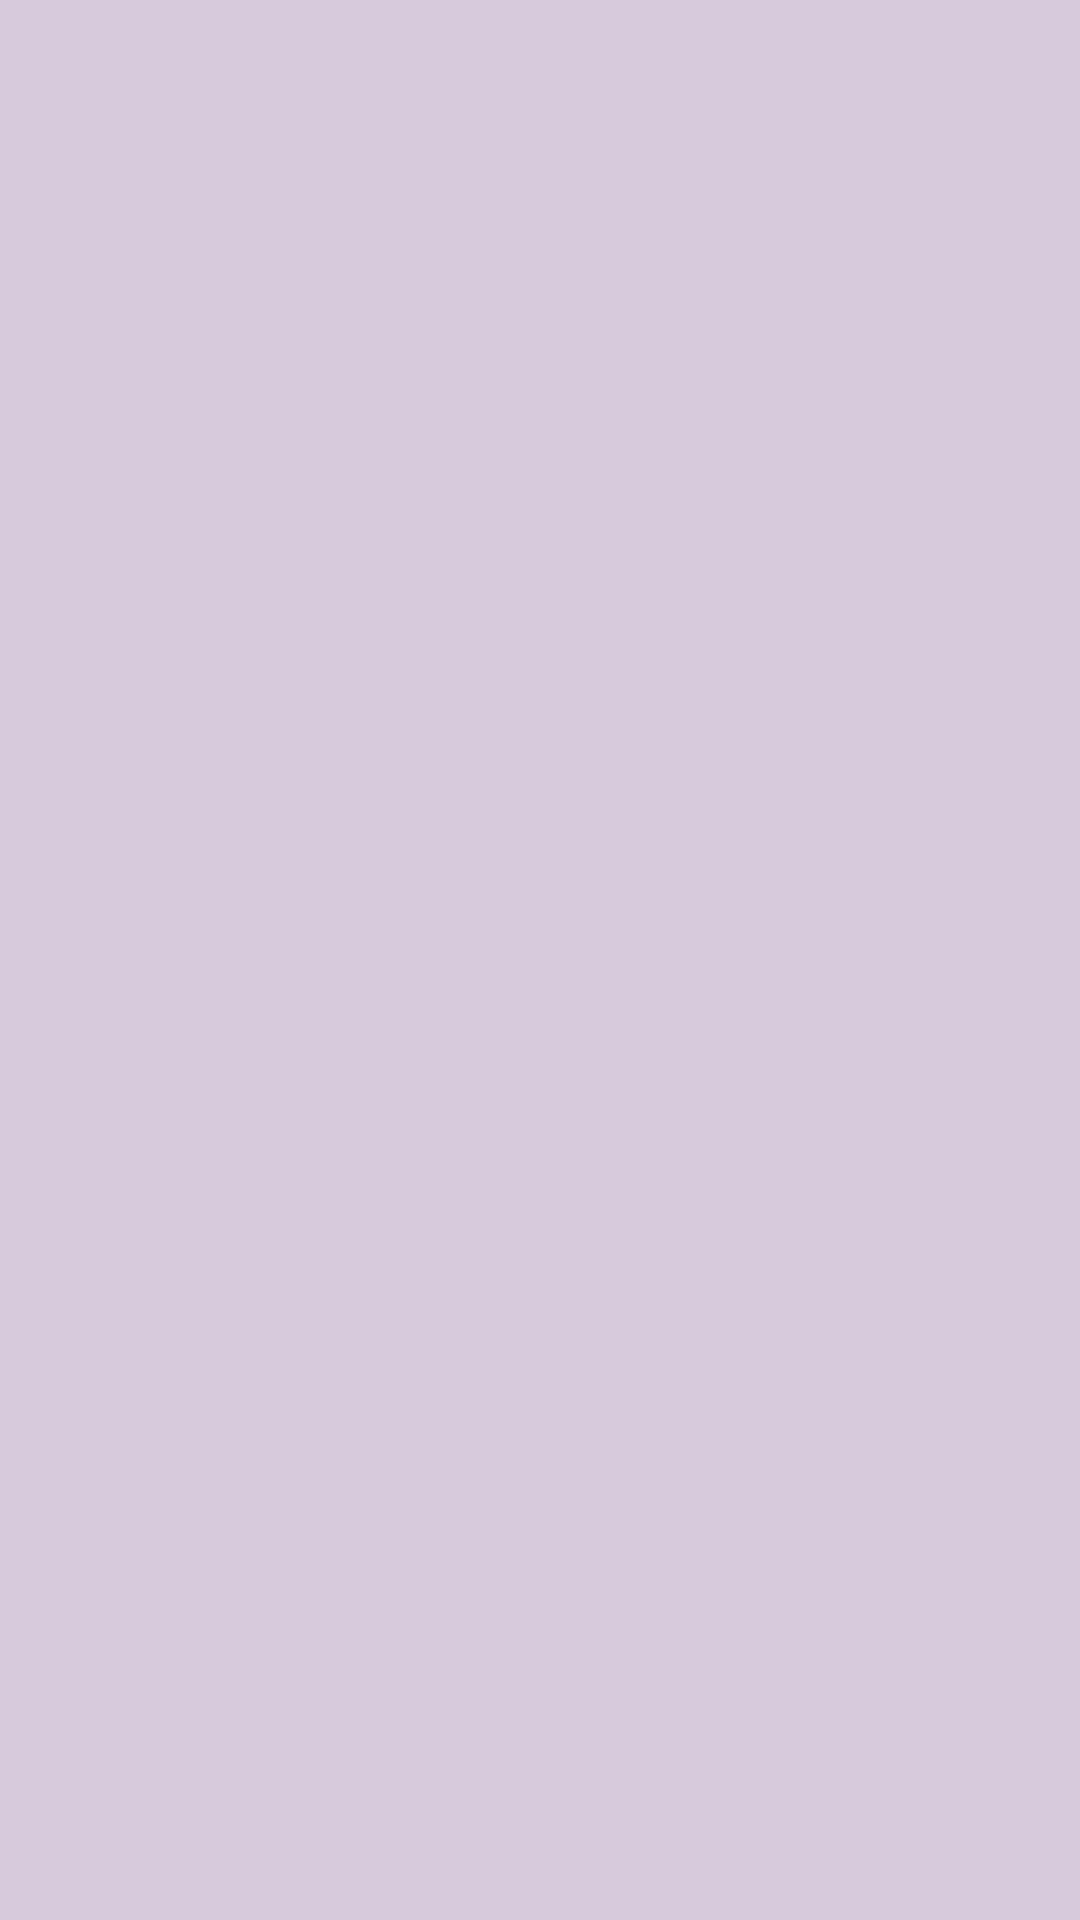 1080x1920 Languid Lavender Solid Color Background